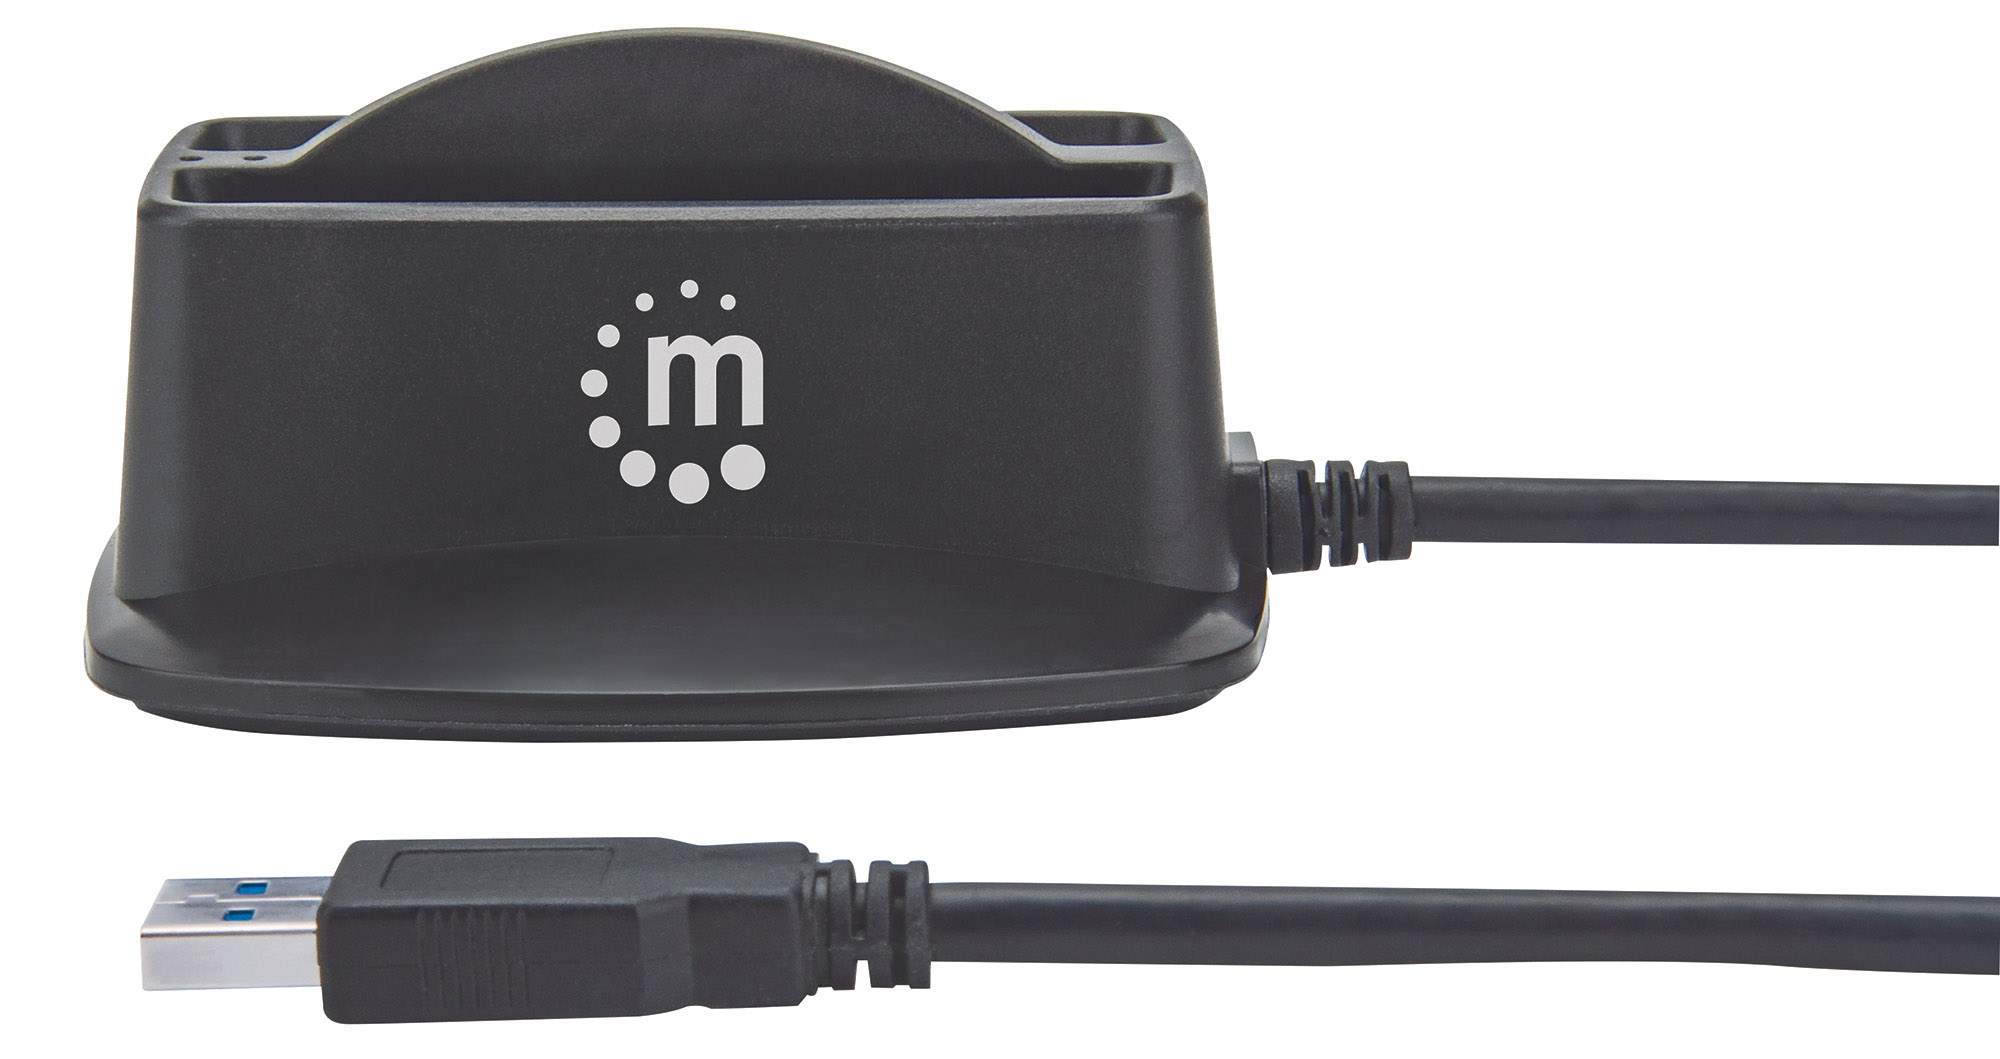 SuperSpeed USB 3.0 Dual 2.5